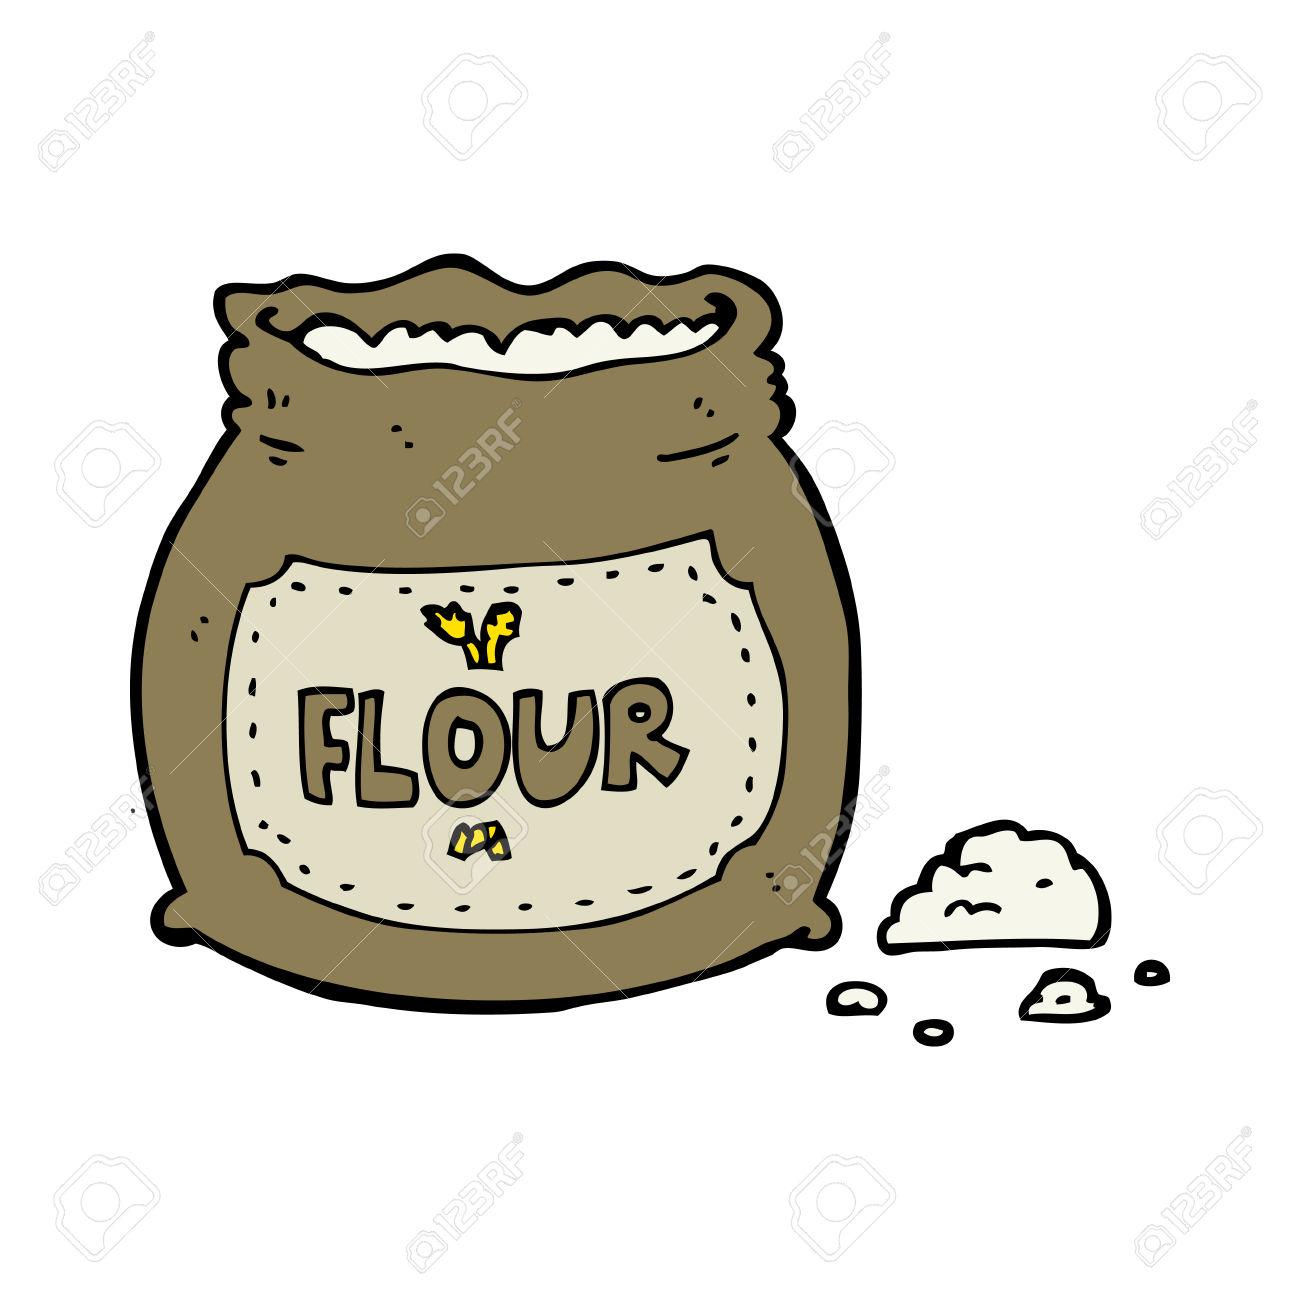 5 flour clipart preview clipart cartoon hdclipartall 5 flour clipart preview clipart